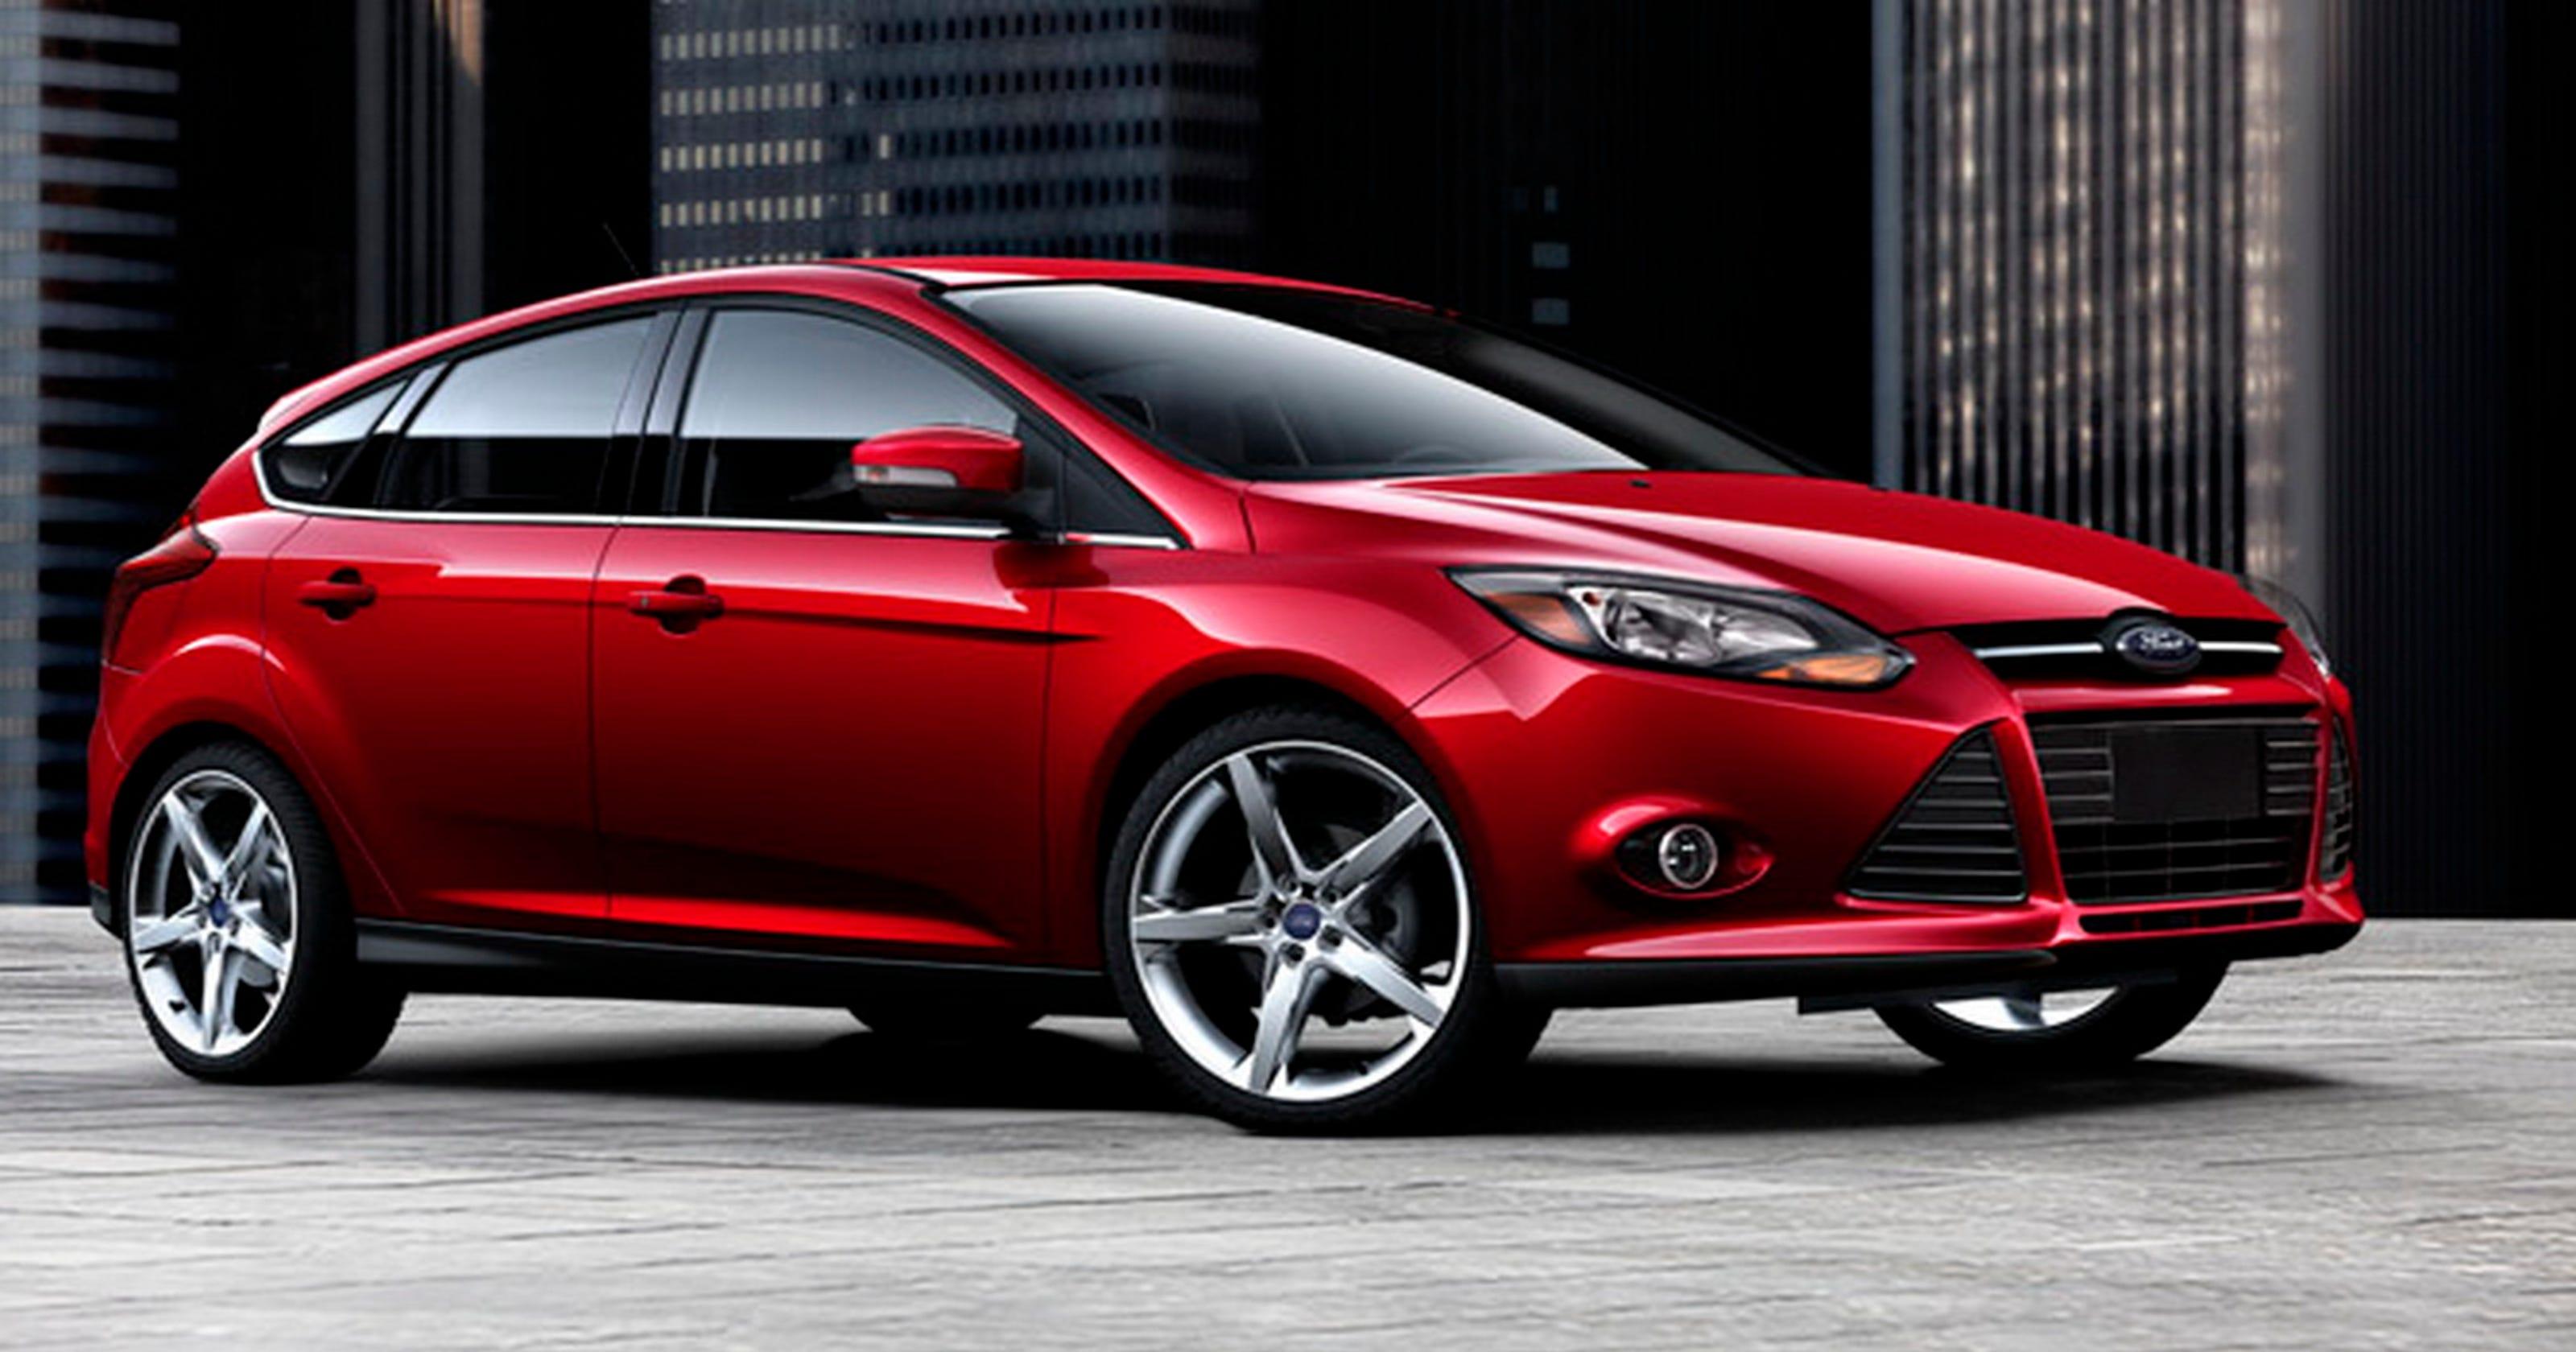 2014 ford focus offers sleek sporty design